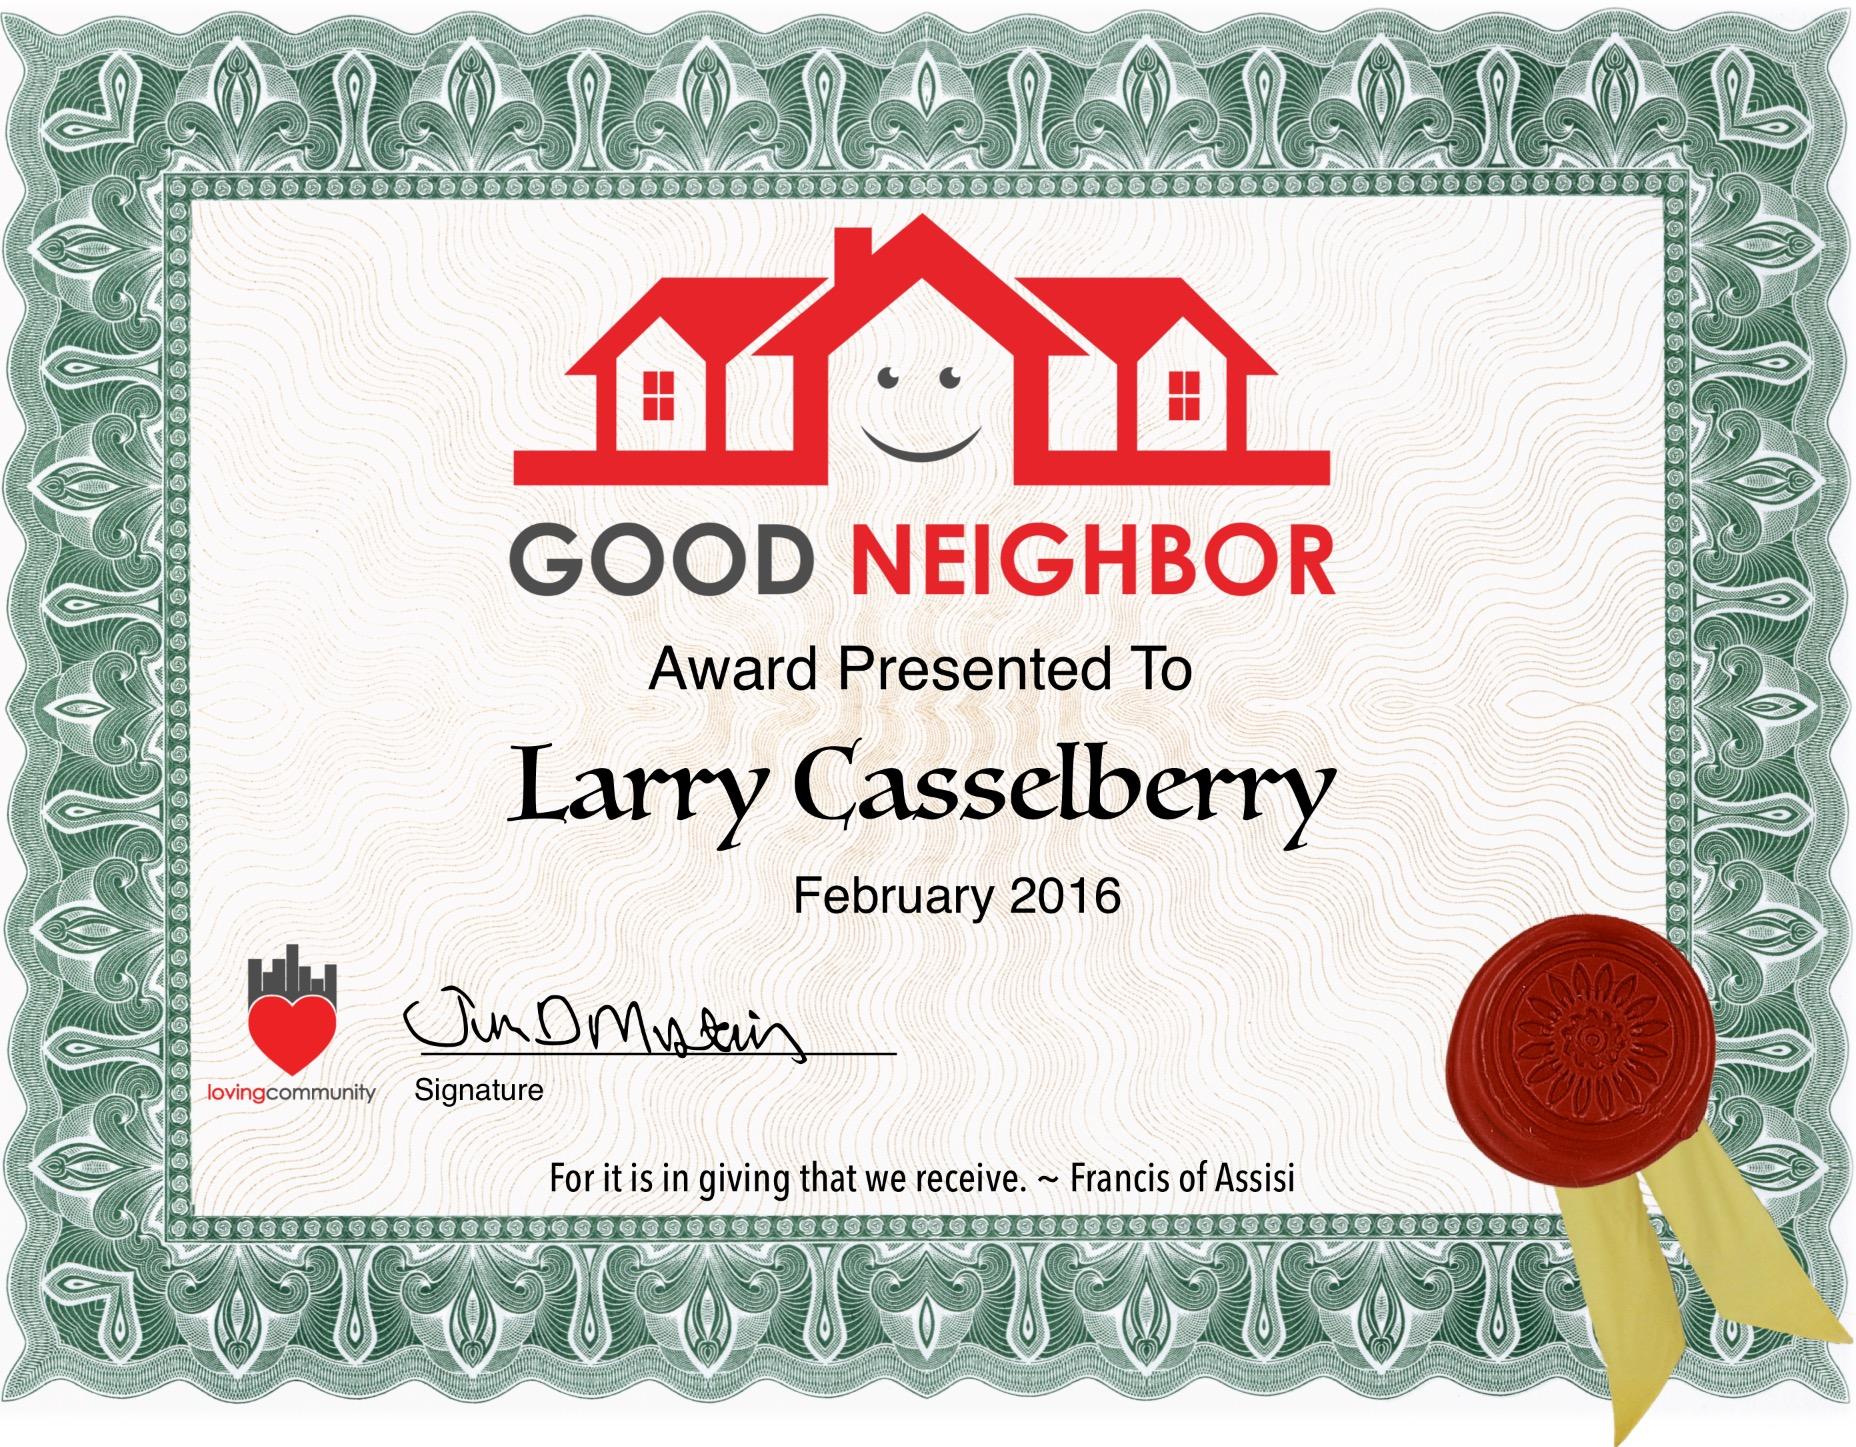 Larry Casselberry Recipient of Good Neighbor Award